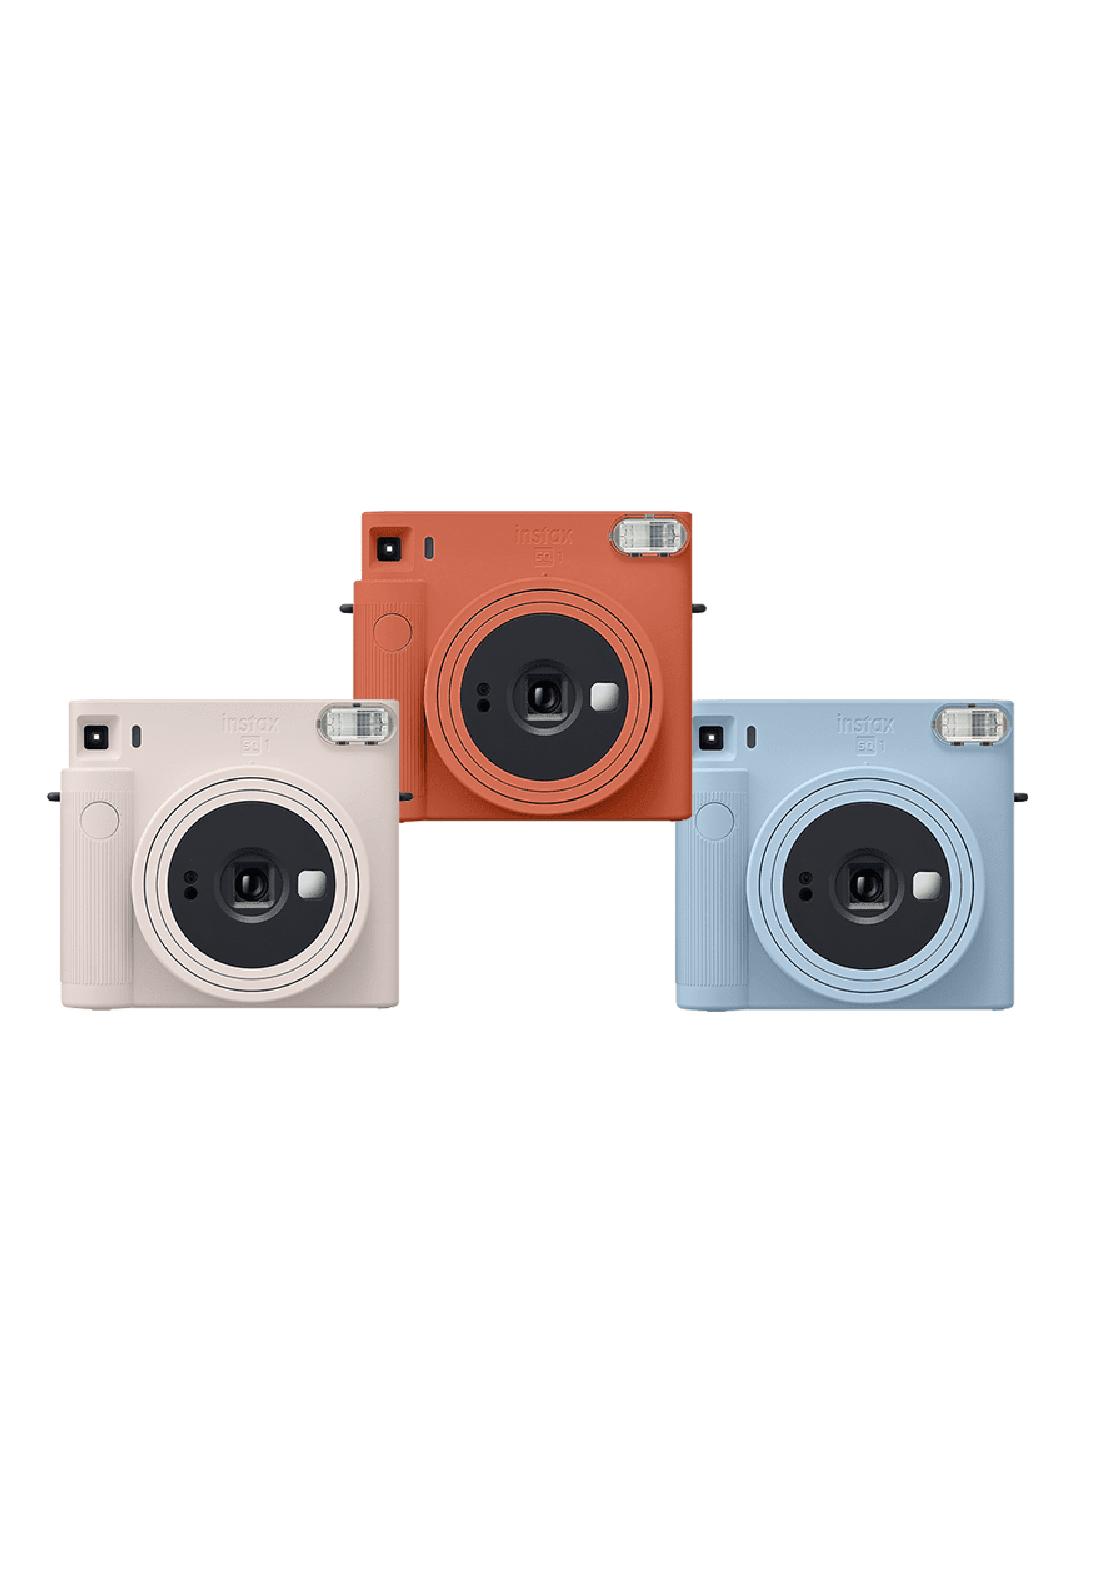 Fujifilm SQ1 Instax Camera كاميرا